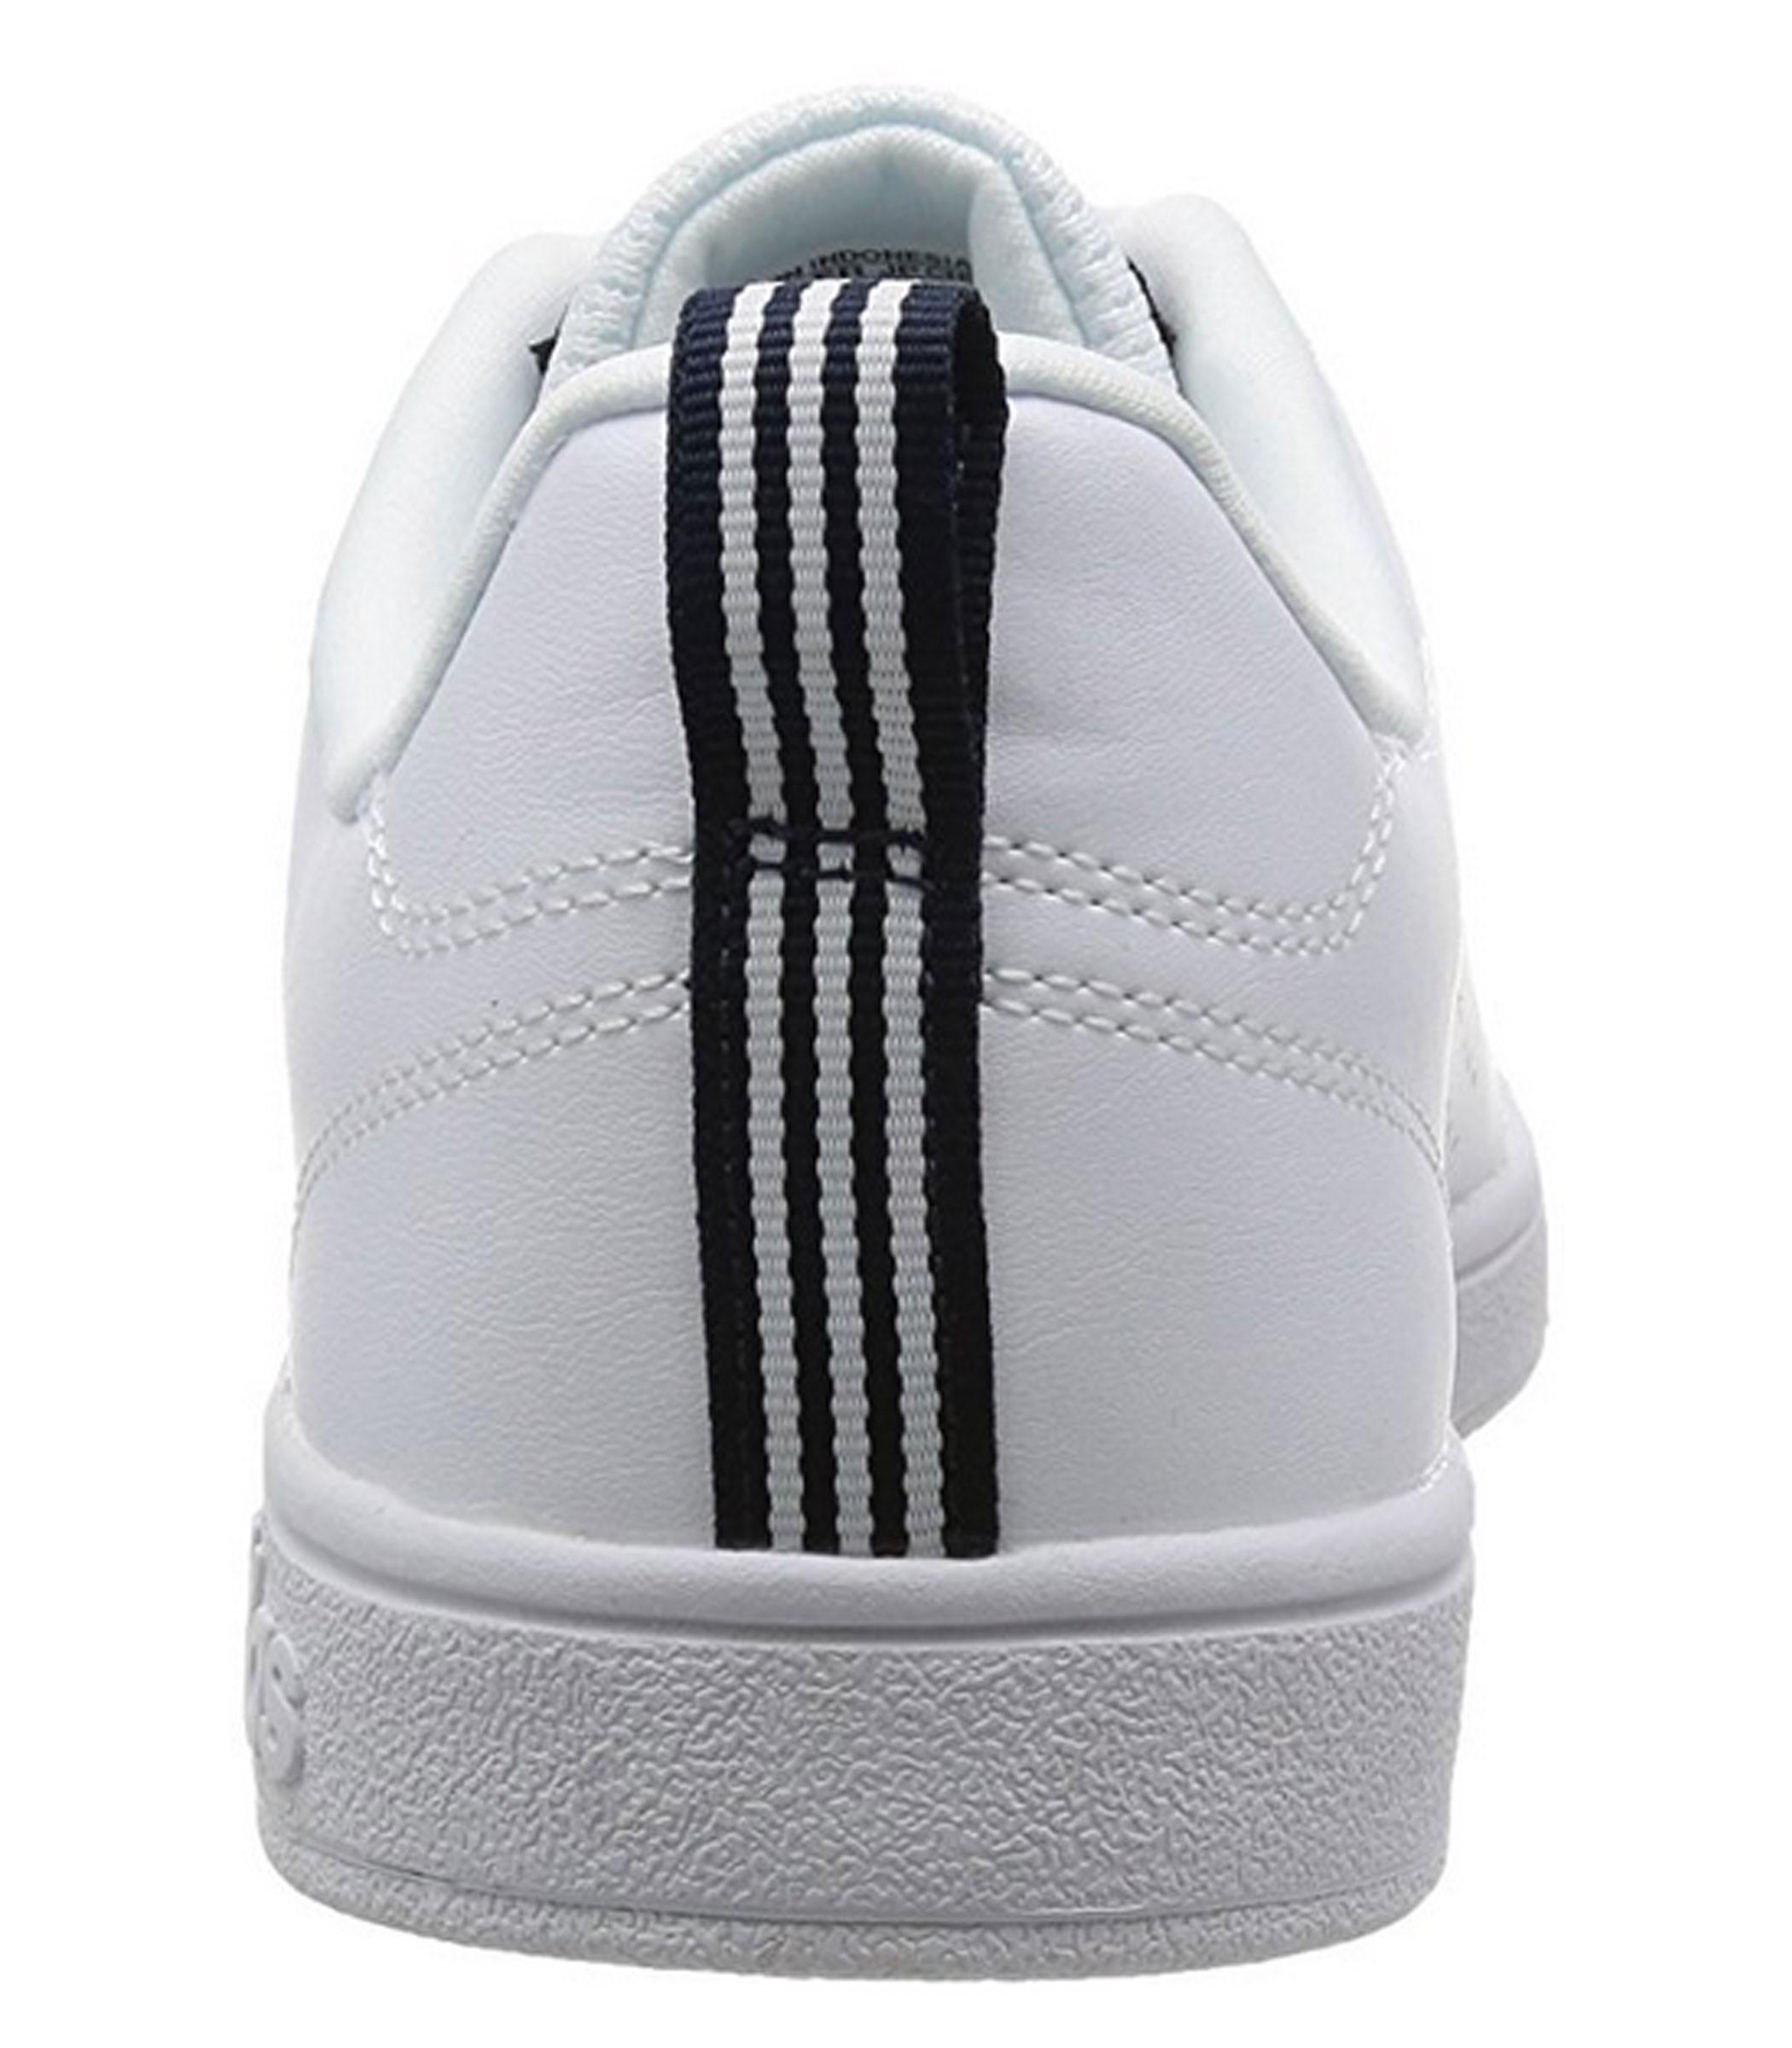 timeless design b6d1f efdf6 F99252 Scarpe Sportive Adidas Vs Advantage CL - Uomo rif.